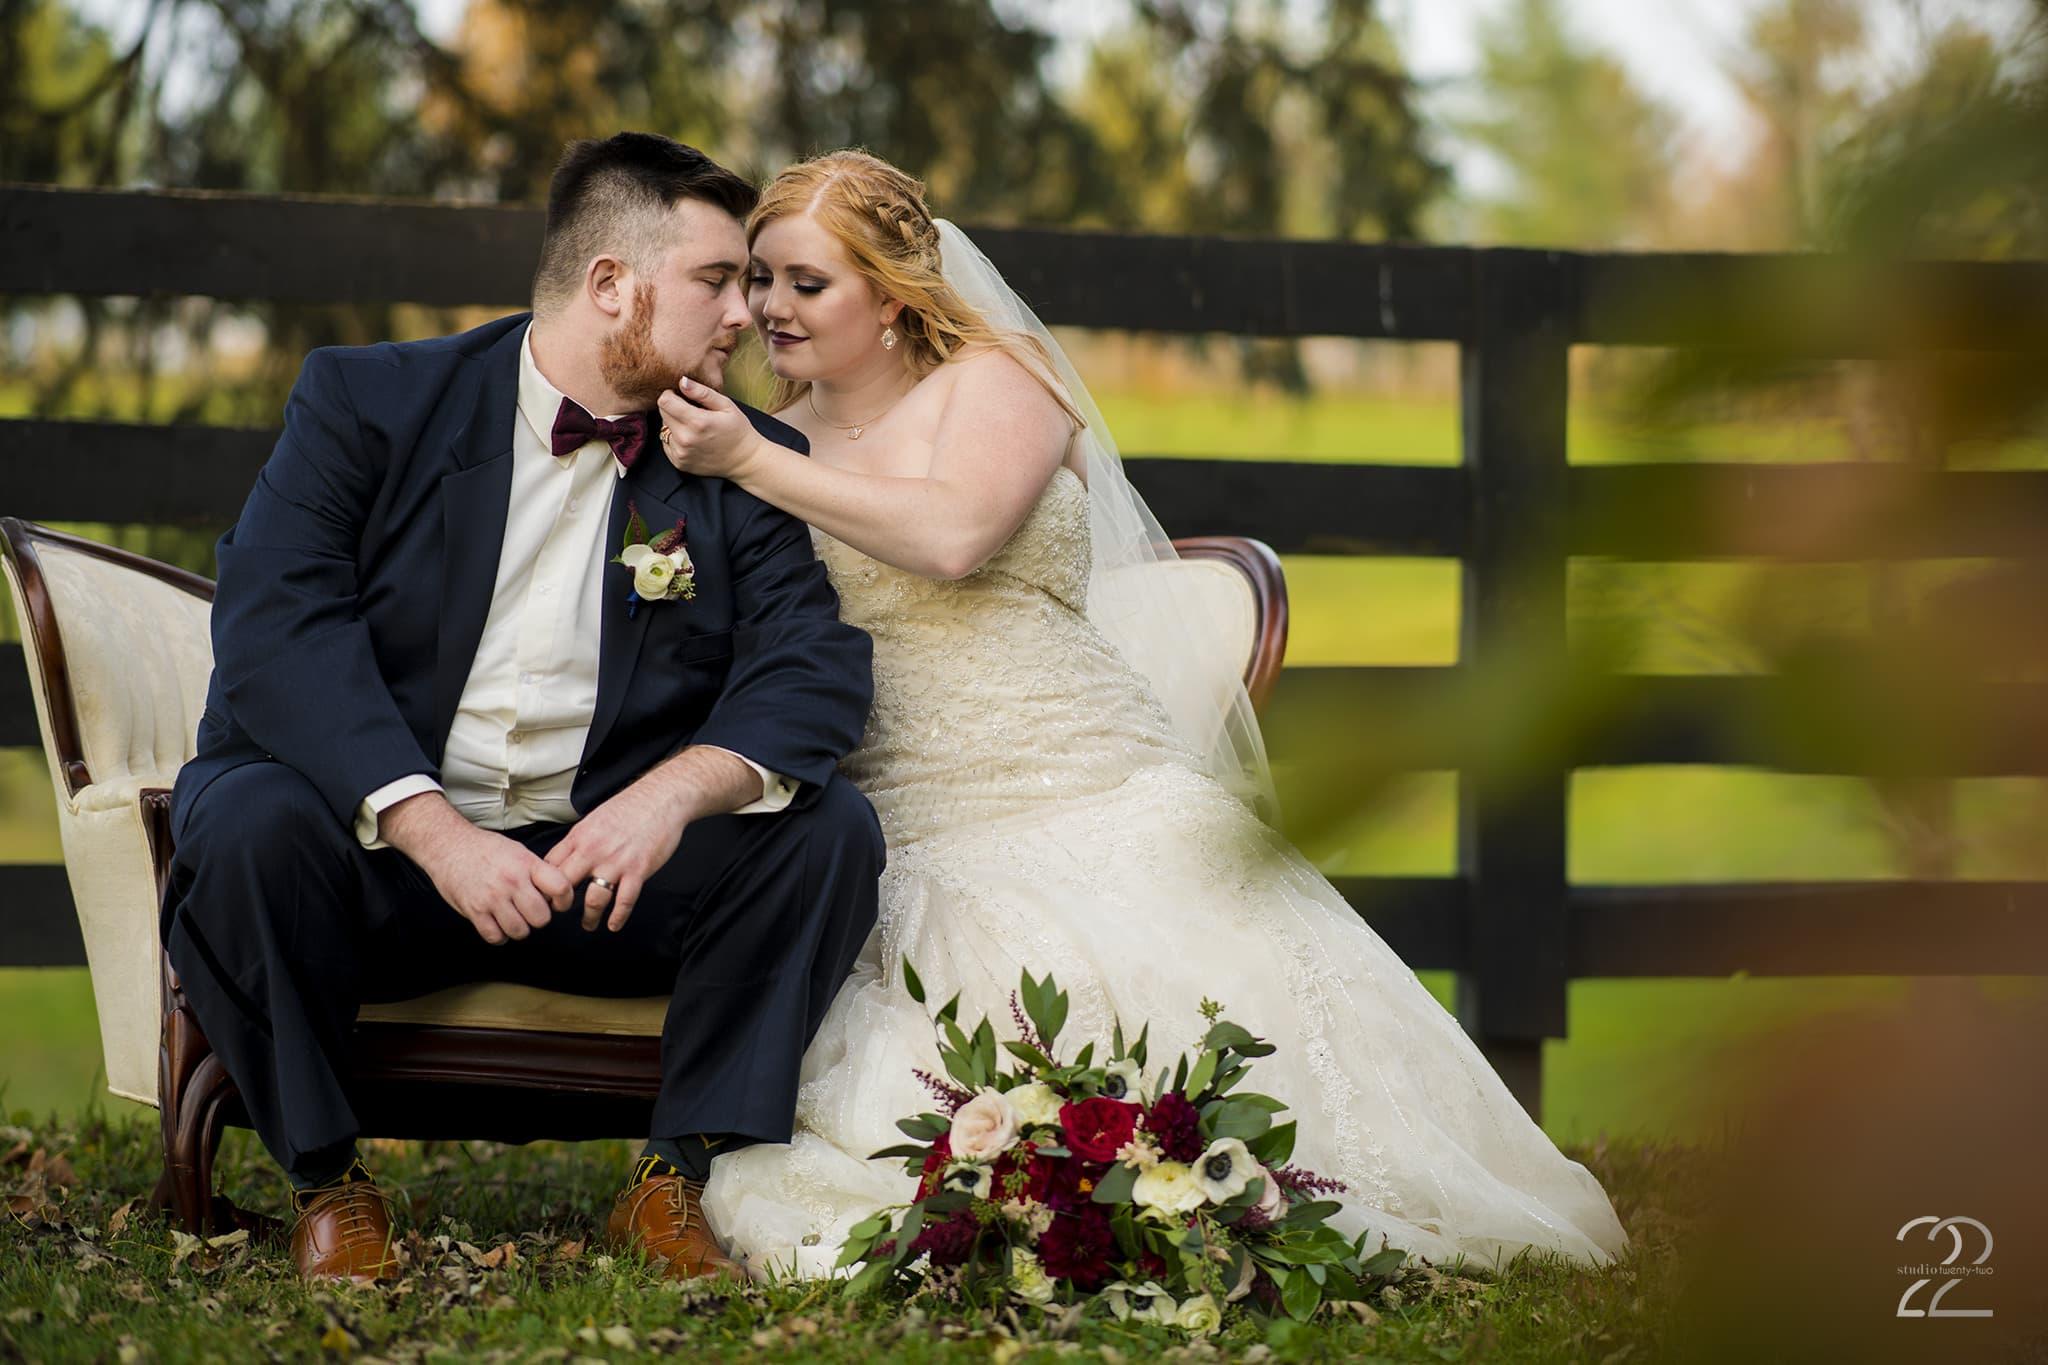 Studio 22 Photography - Southern Weddings - Bride & Groom Portraits